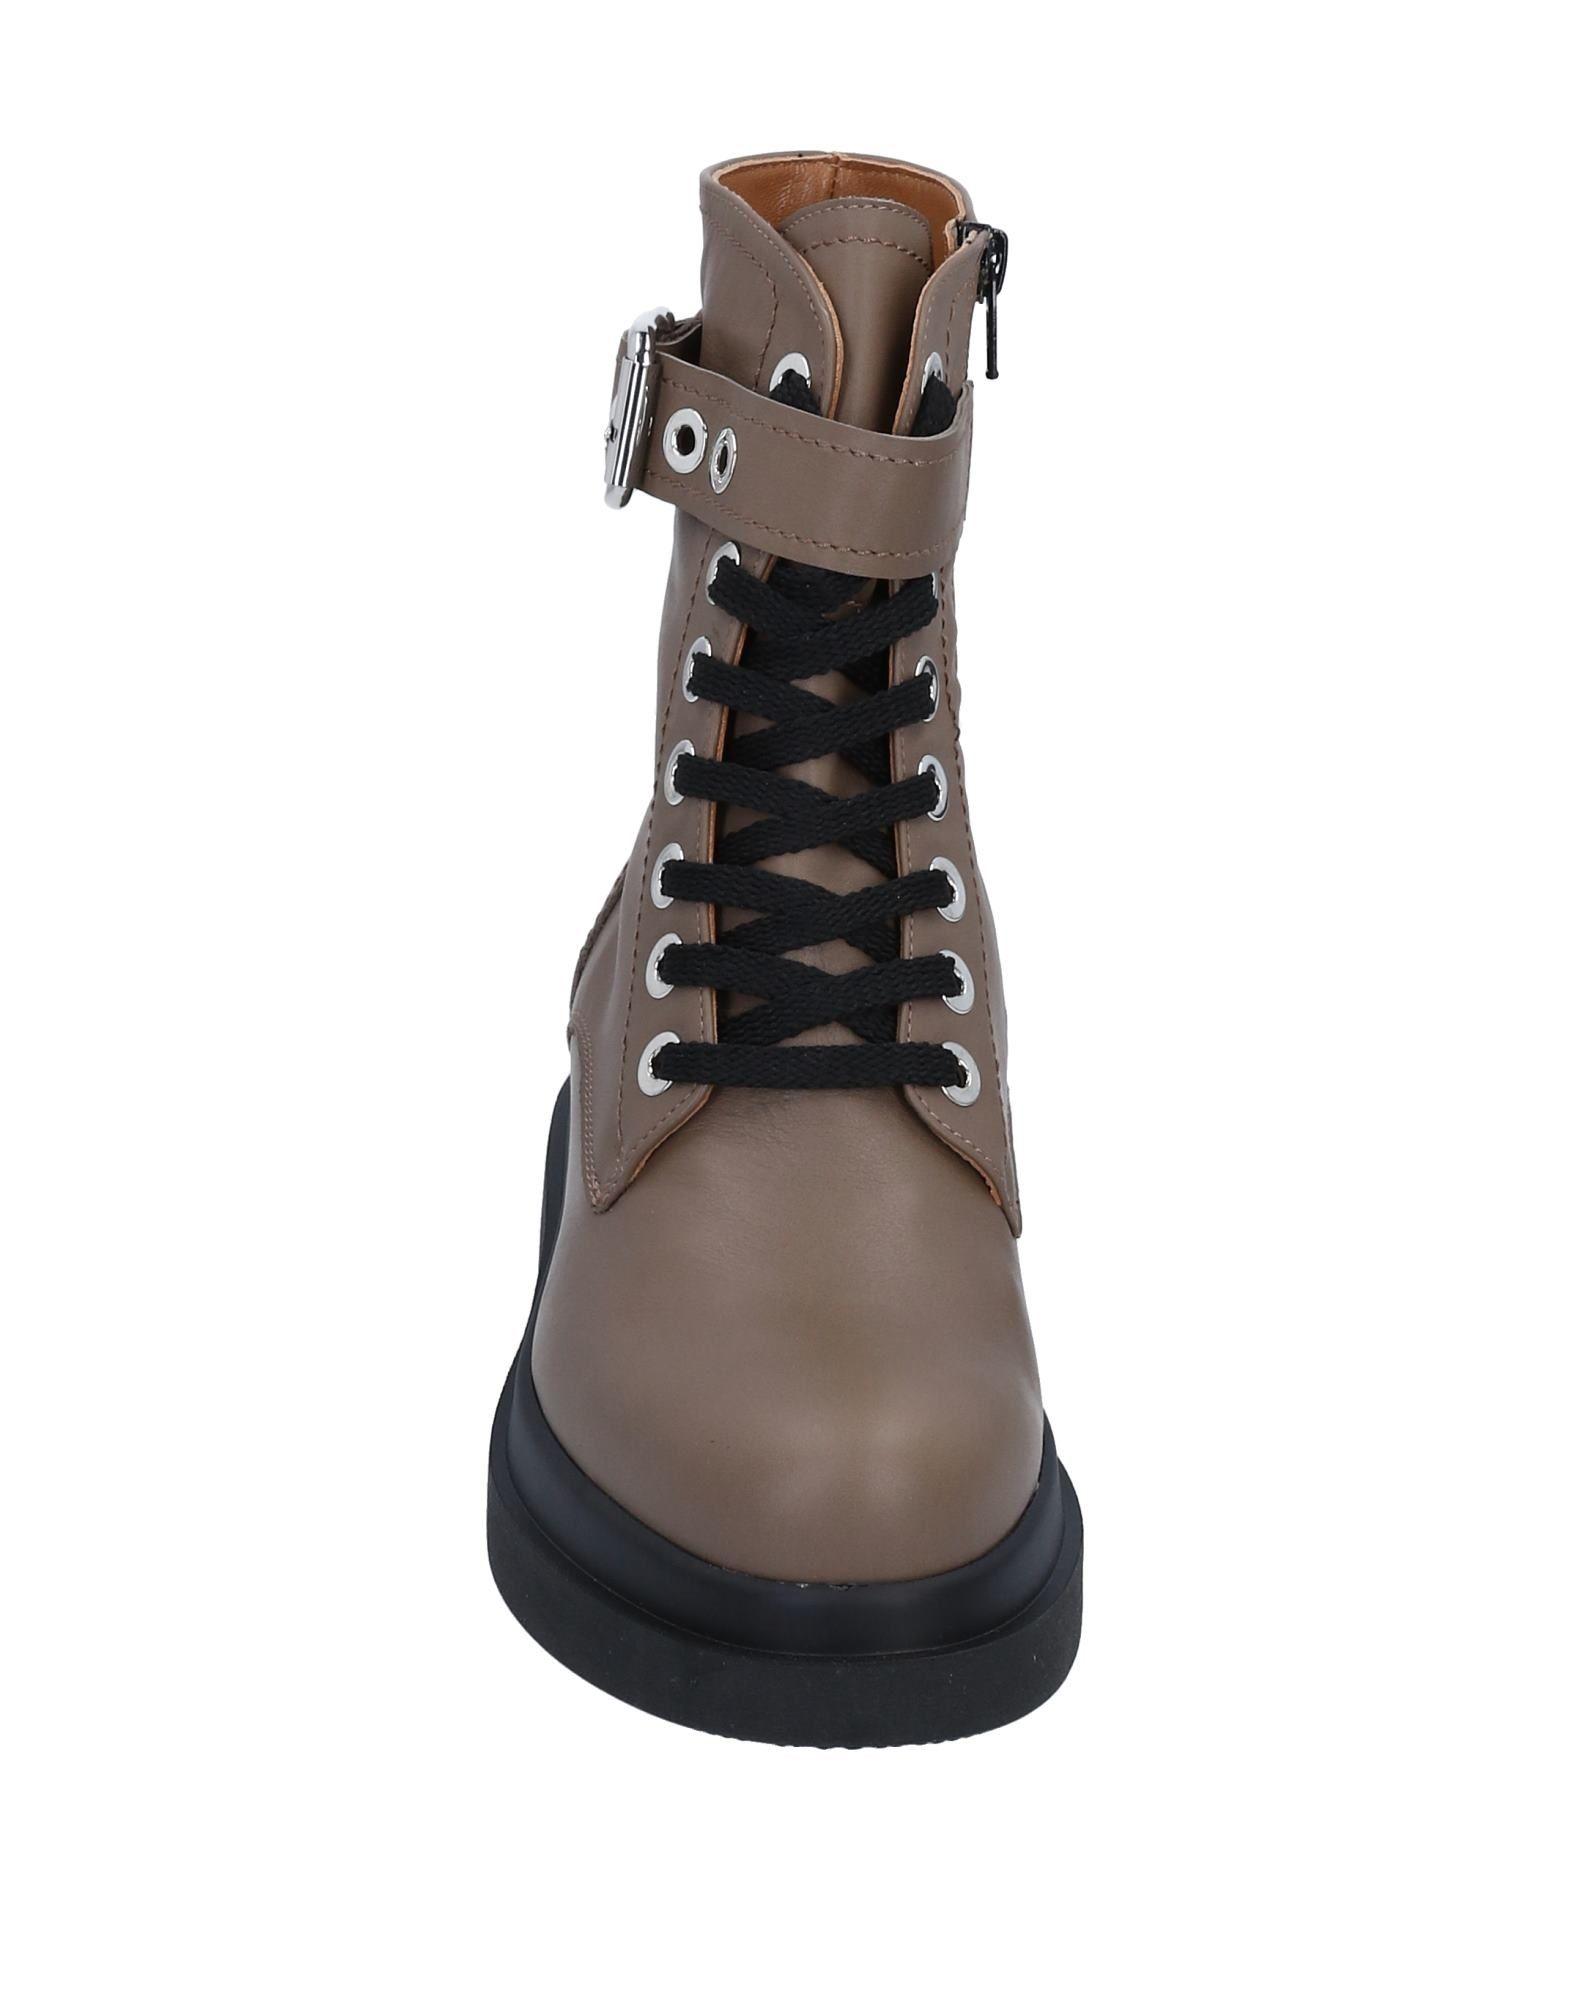 Rabatt Schuhe Norma Damen J.Baker Stiefelette Damen Norma  11516313AD 48afb0